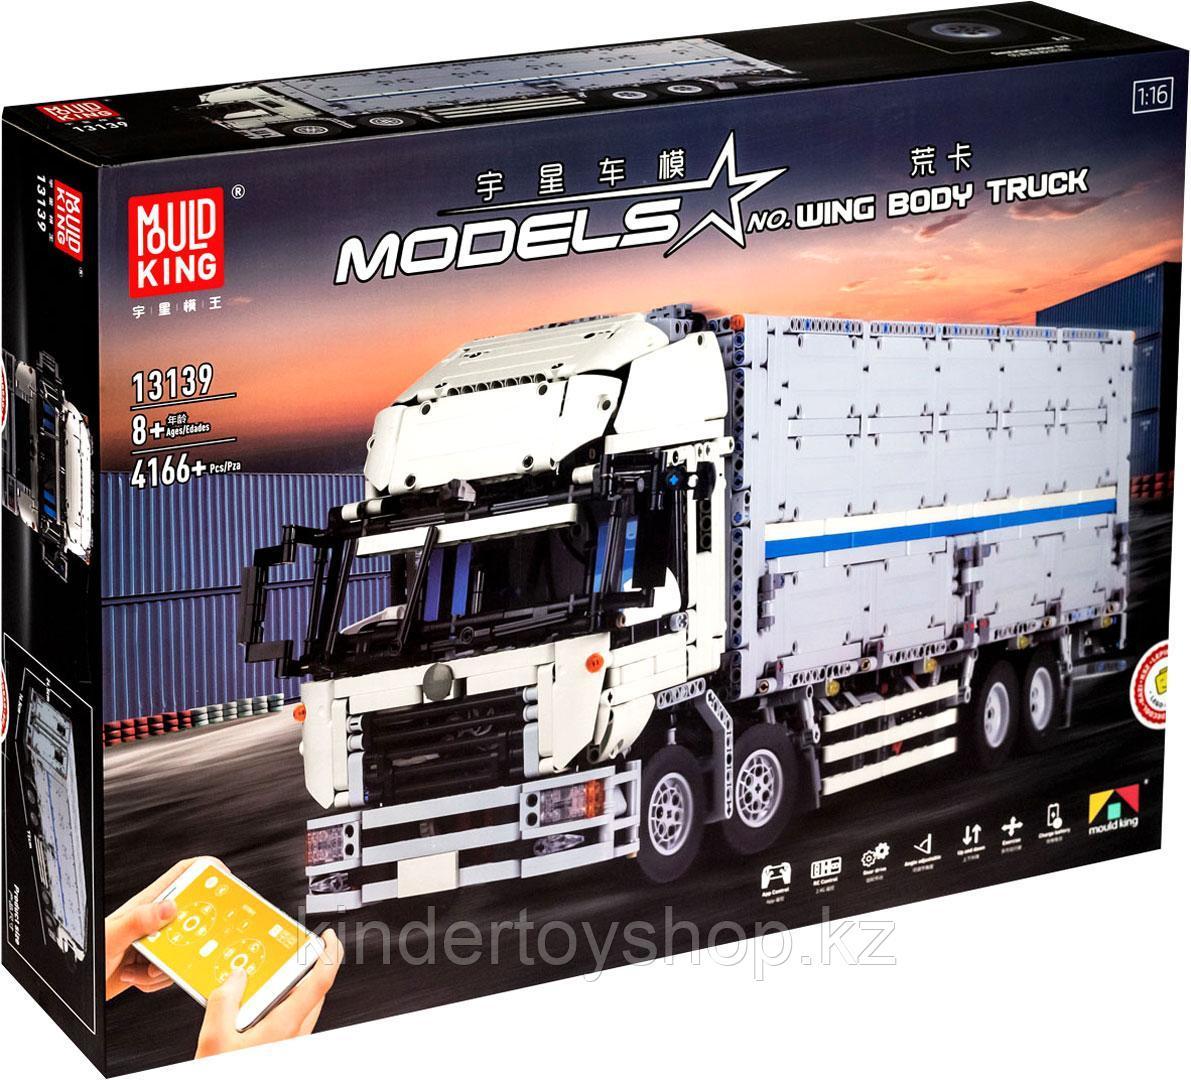 Аналог лего Lego Technic MOC-1389  LEPIN 23008 Mould King 13139  Wing Body Truck грузовик фура